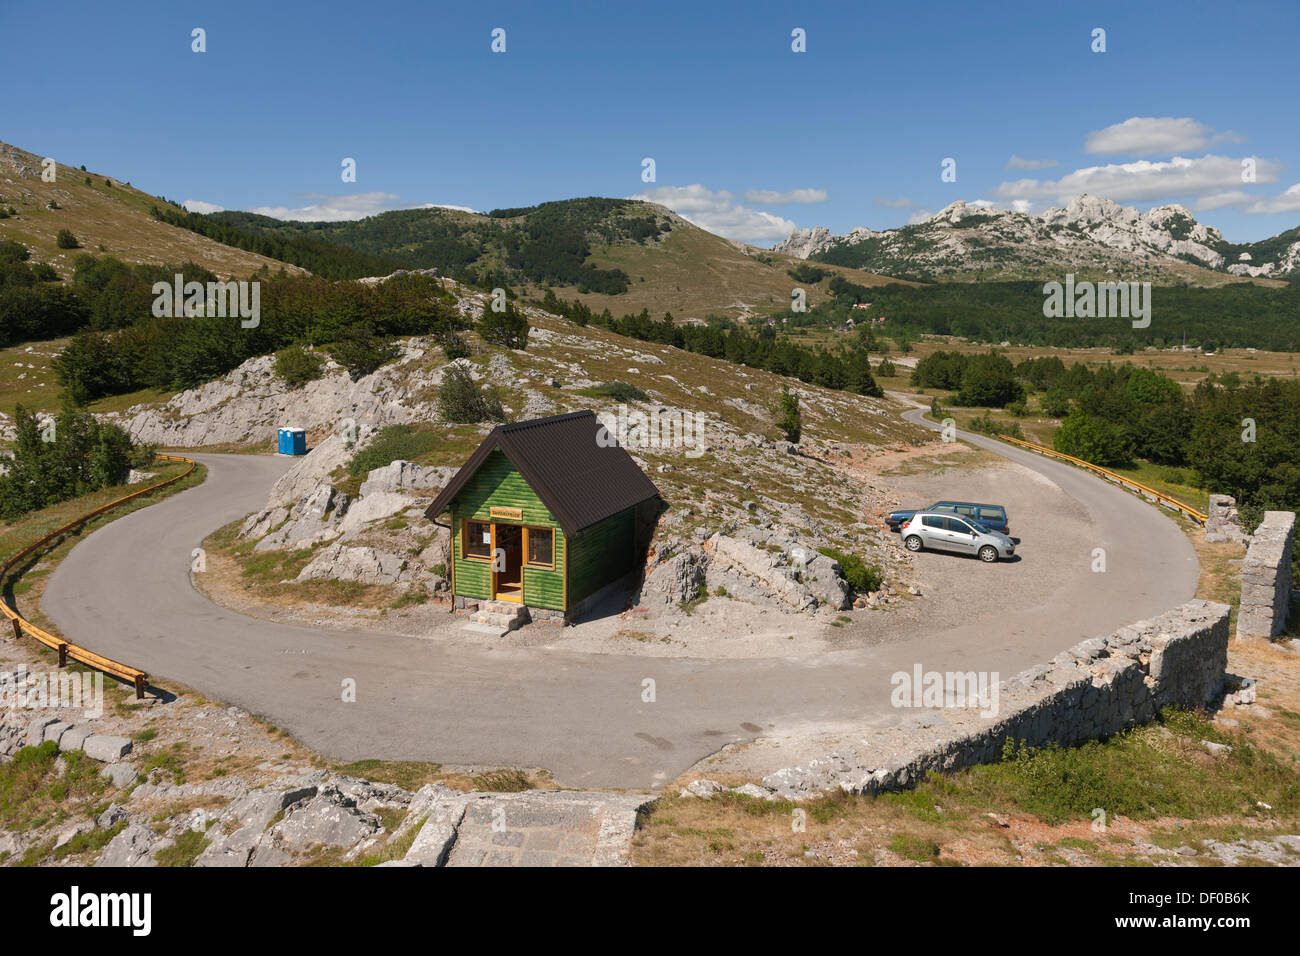 Pass road, Dalmatian Mountains, Dalmatia, Croatia, Southern Europe, Europe - Stock Image